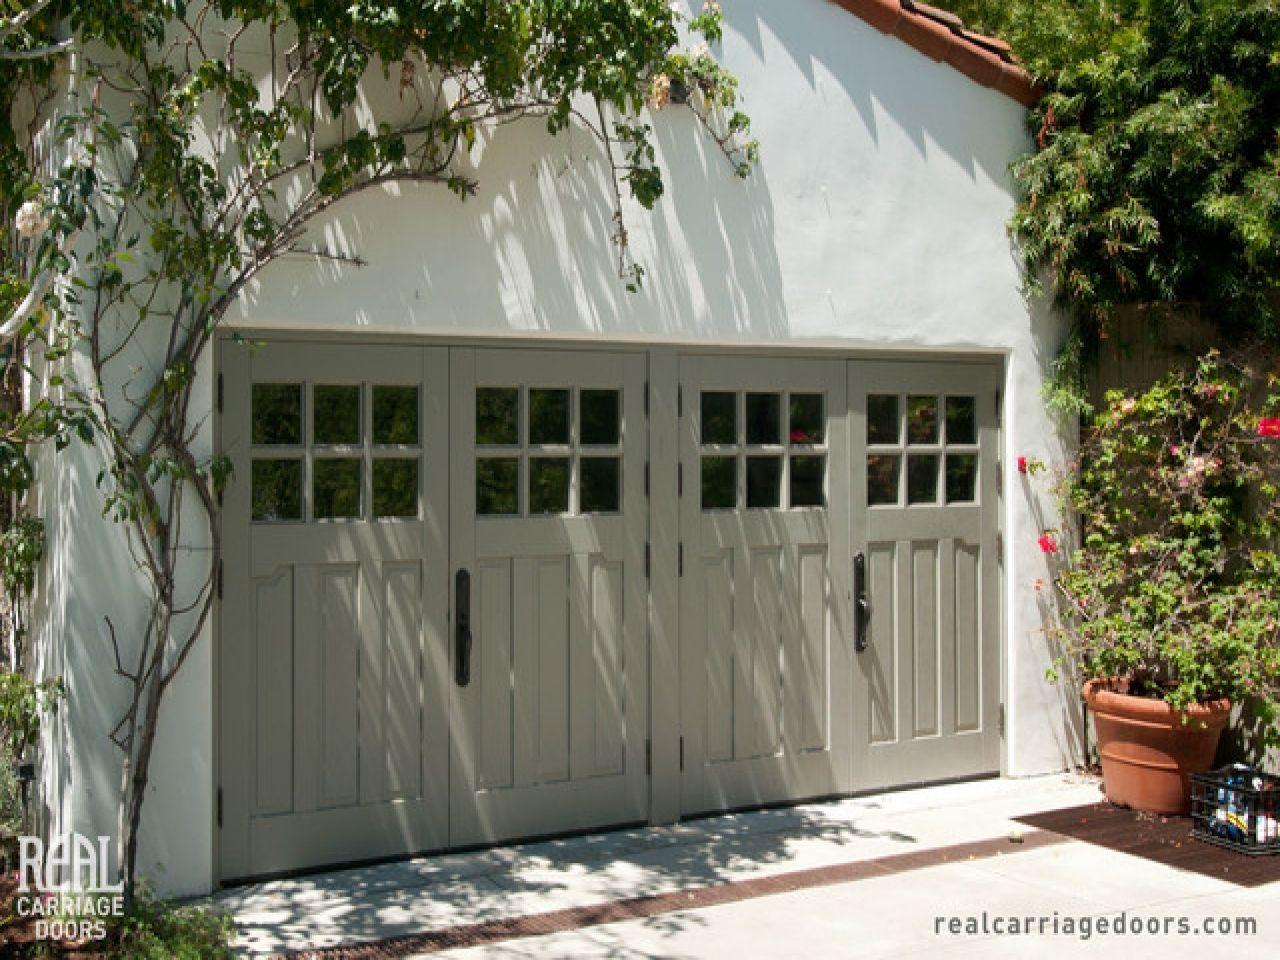 craftsman style garage garage door panels double carriage garage ...